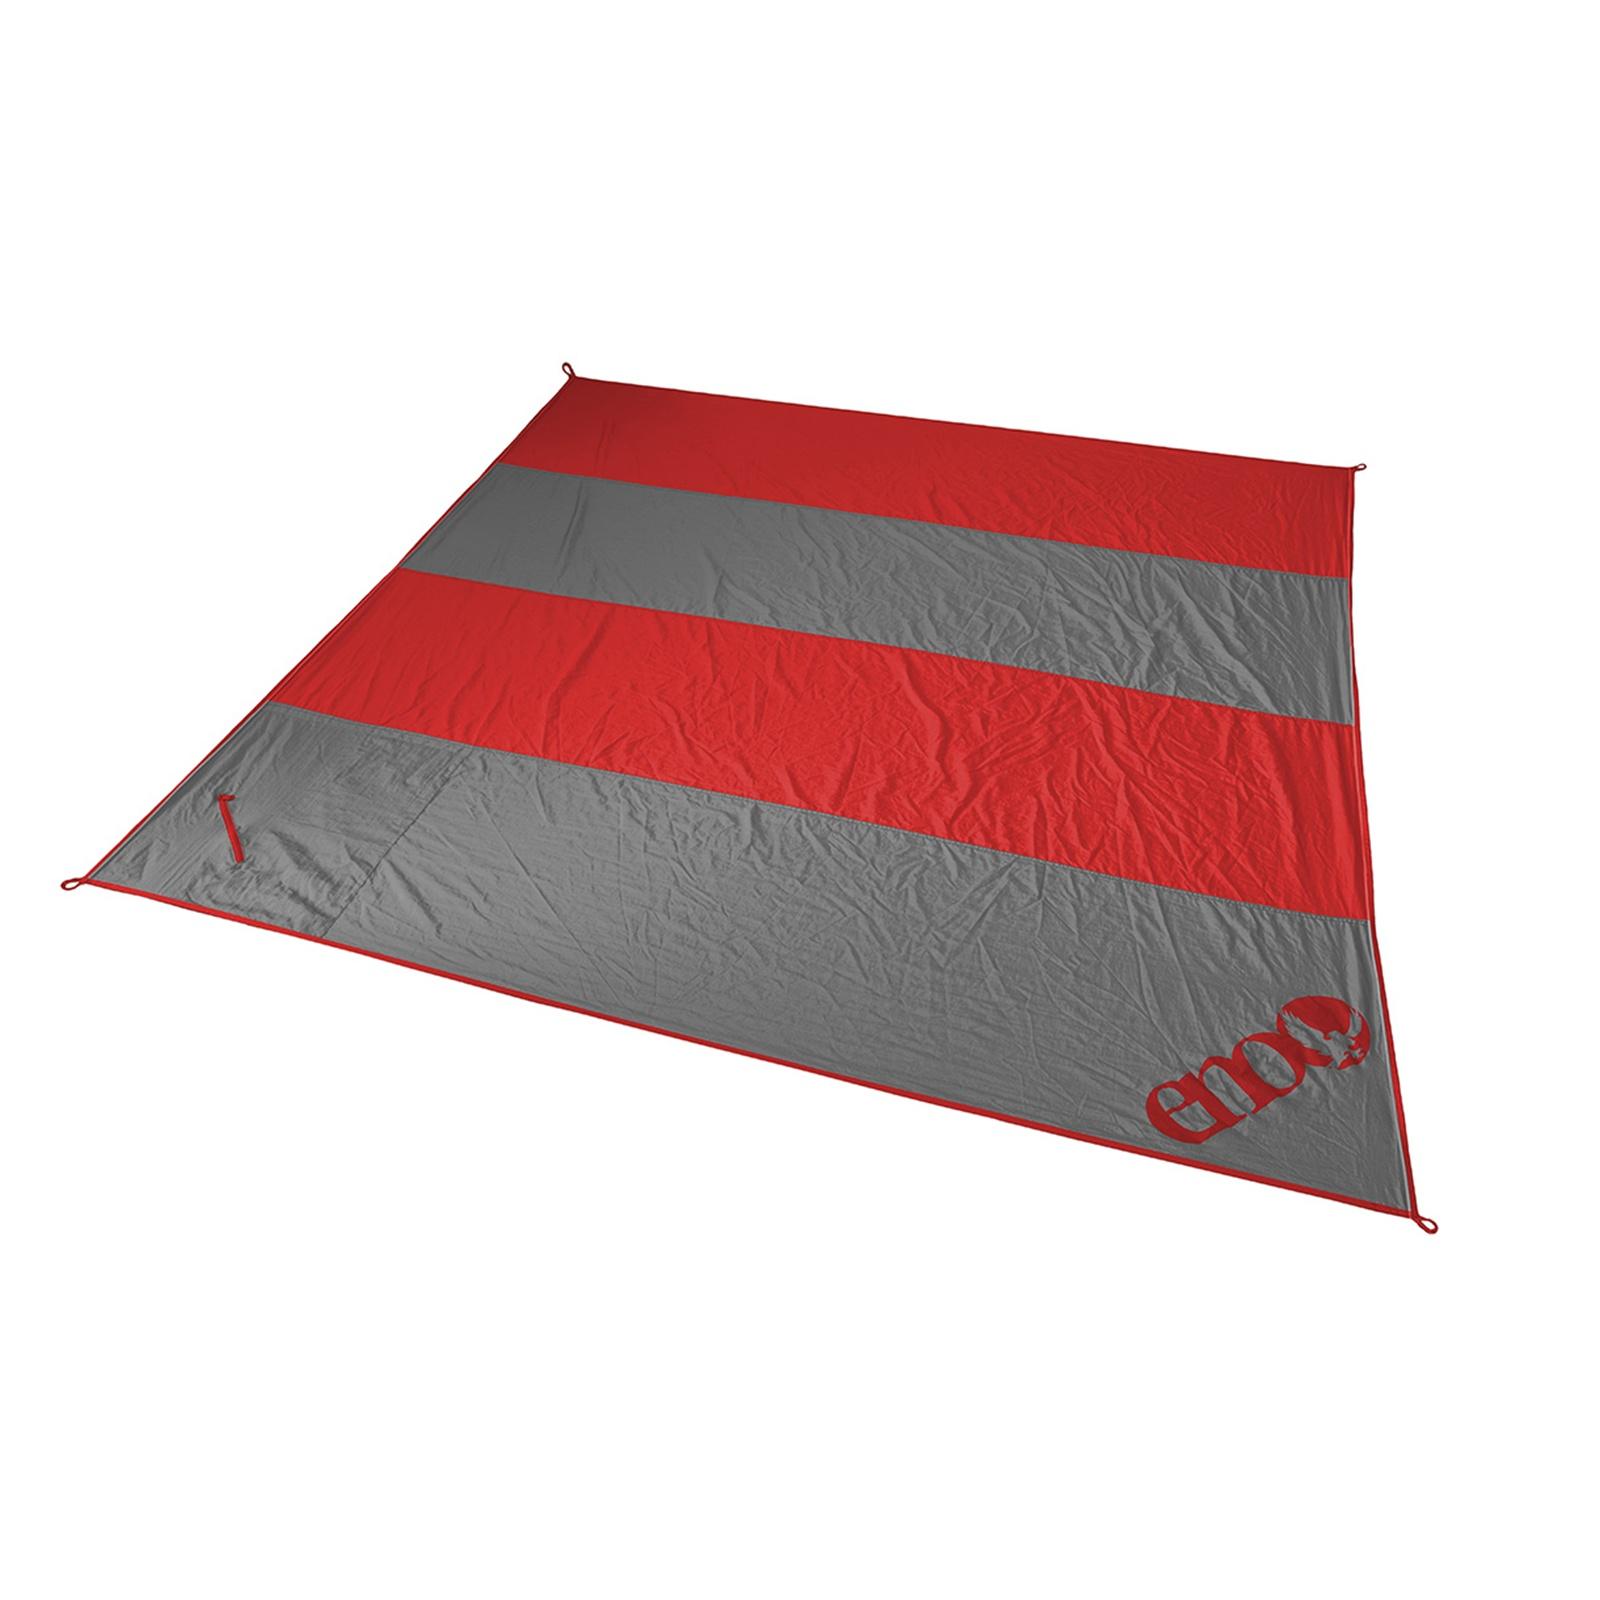 Islander Blanket Red/Charcoal